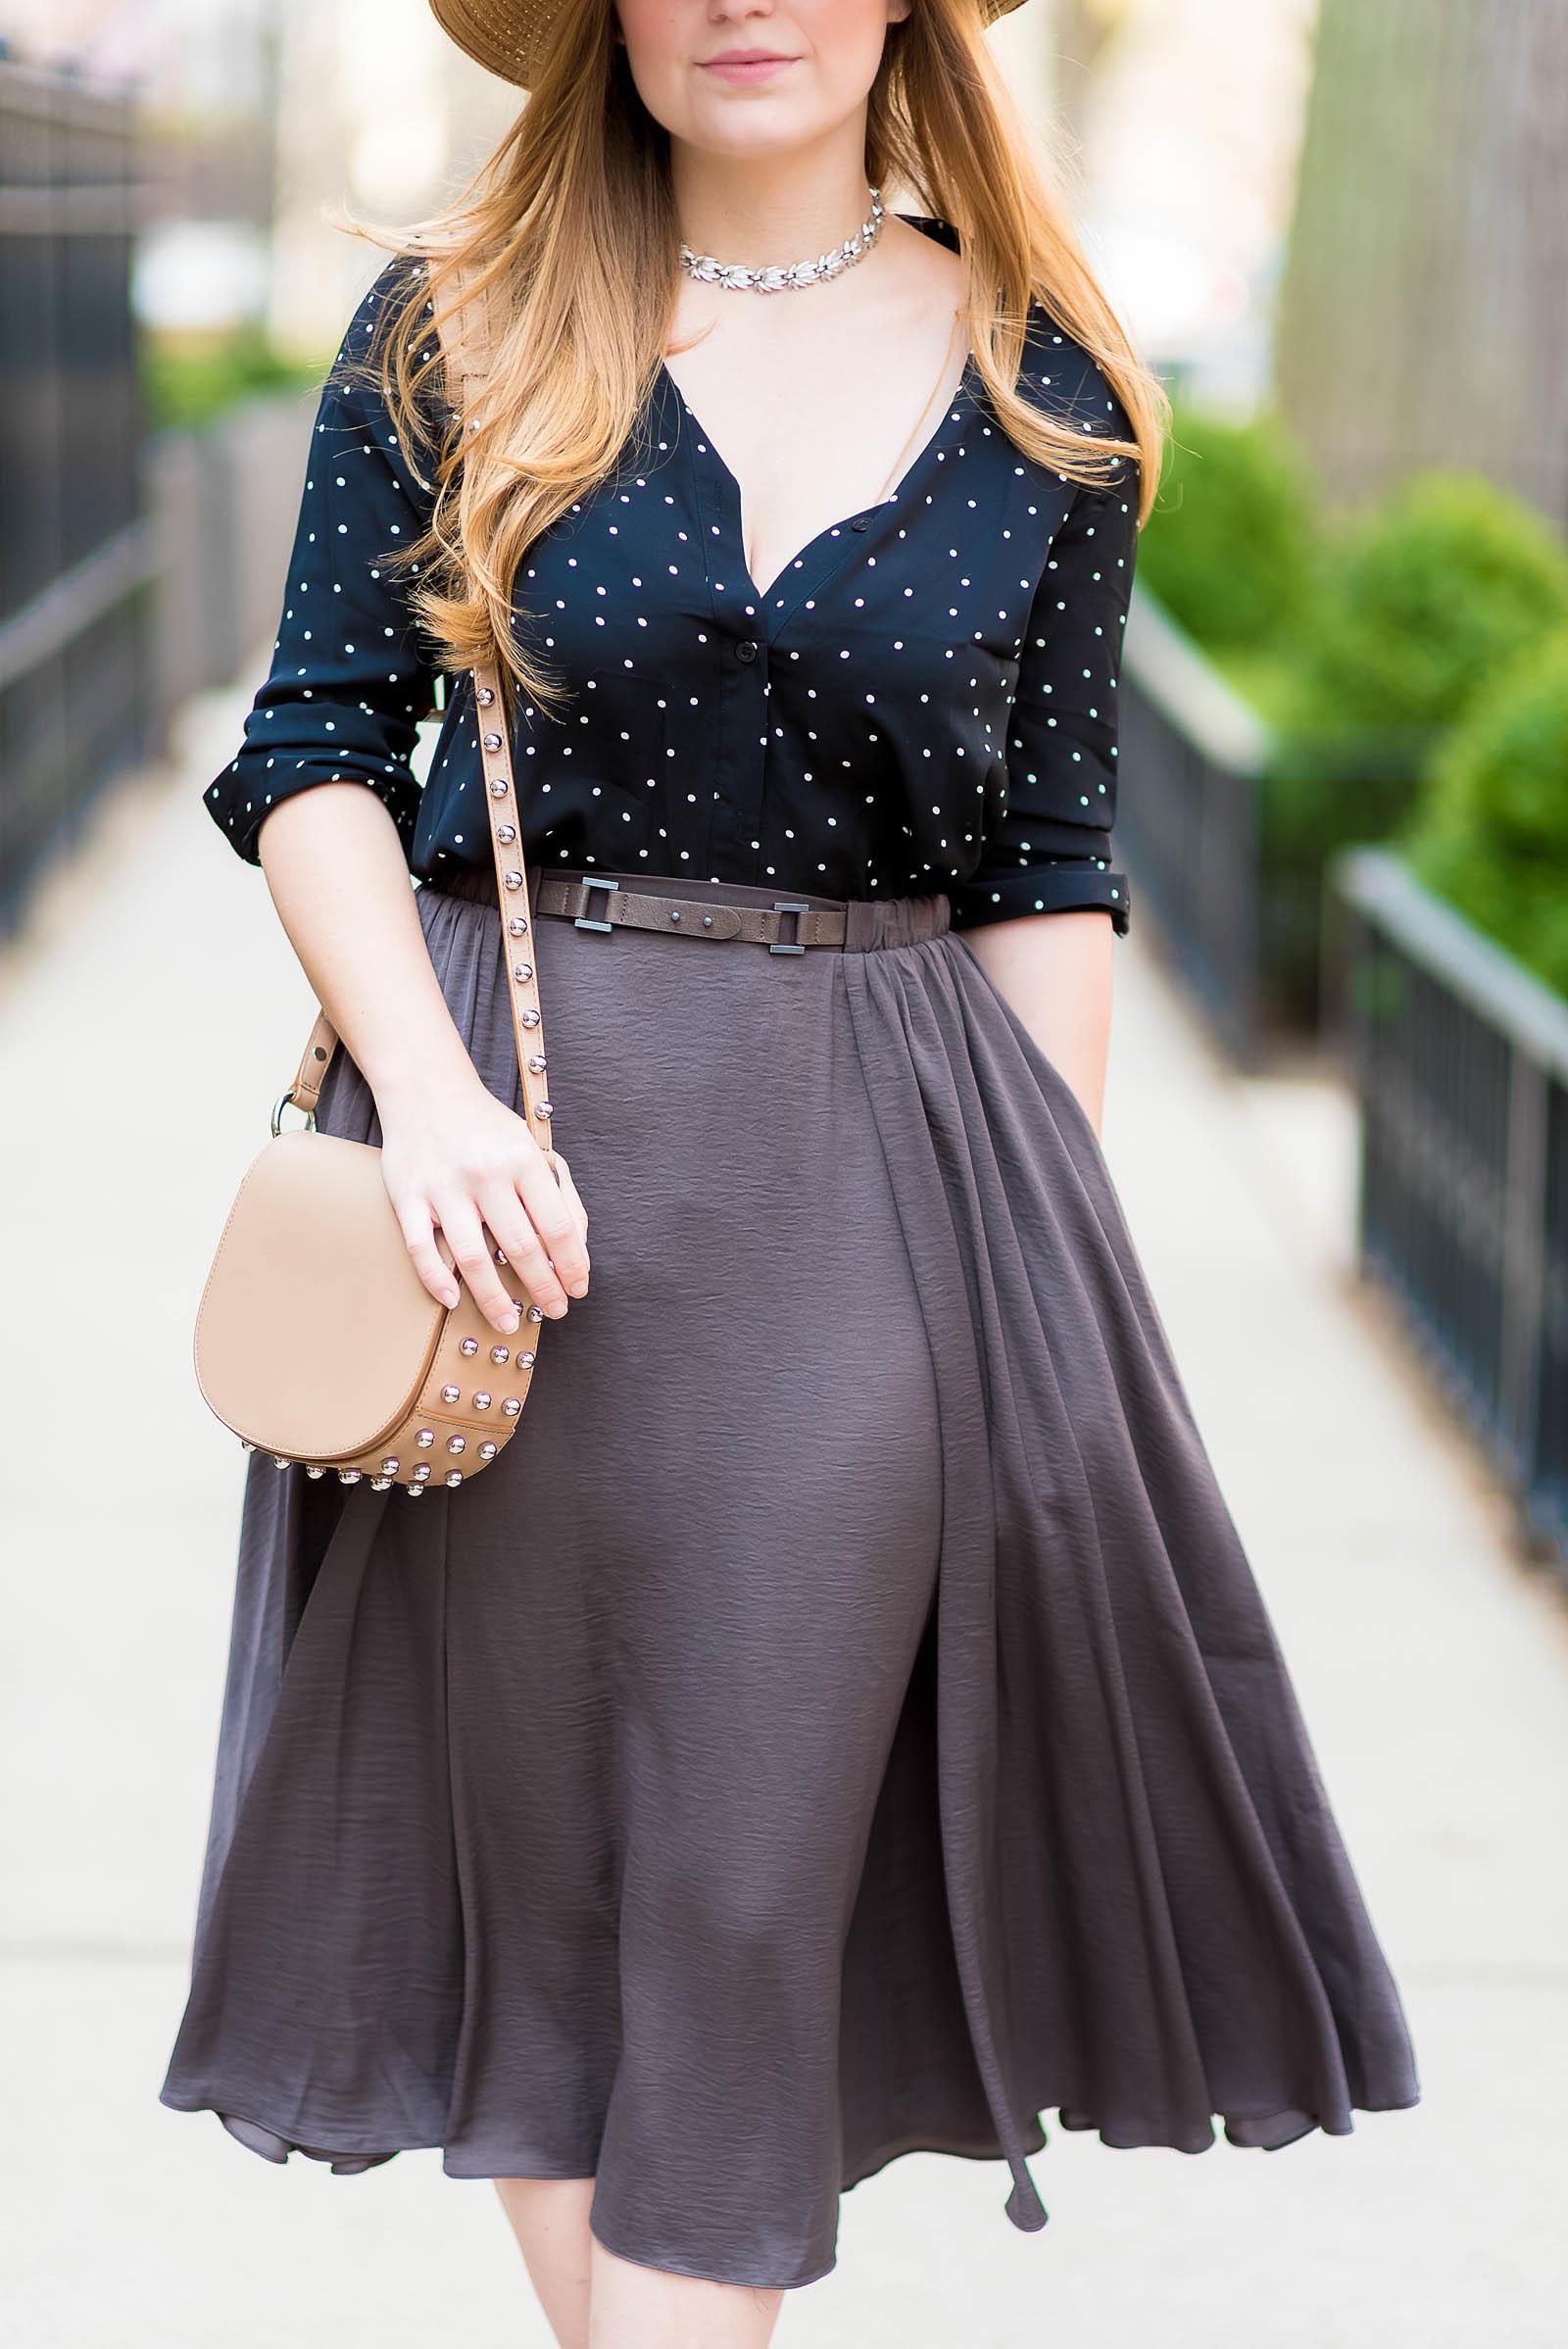 Summer Midi Skirt Outfit Boater Hat Alexander Wang Aquazzura